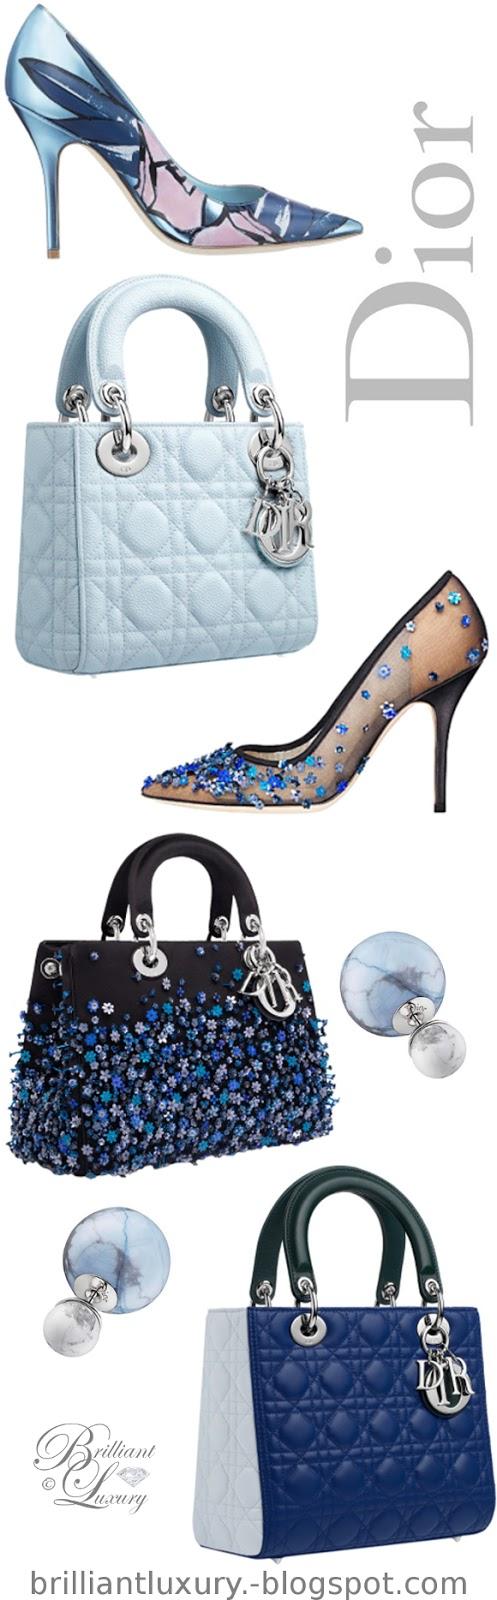 Brilliant Luxury ♦ Dior accessories ss 2015